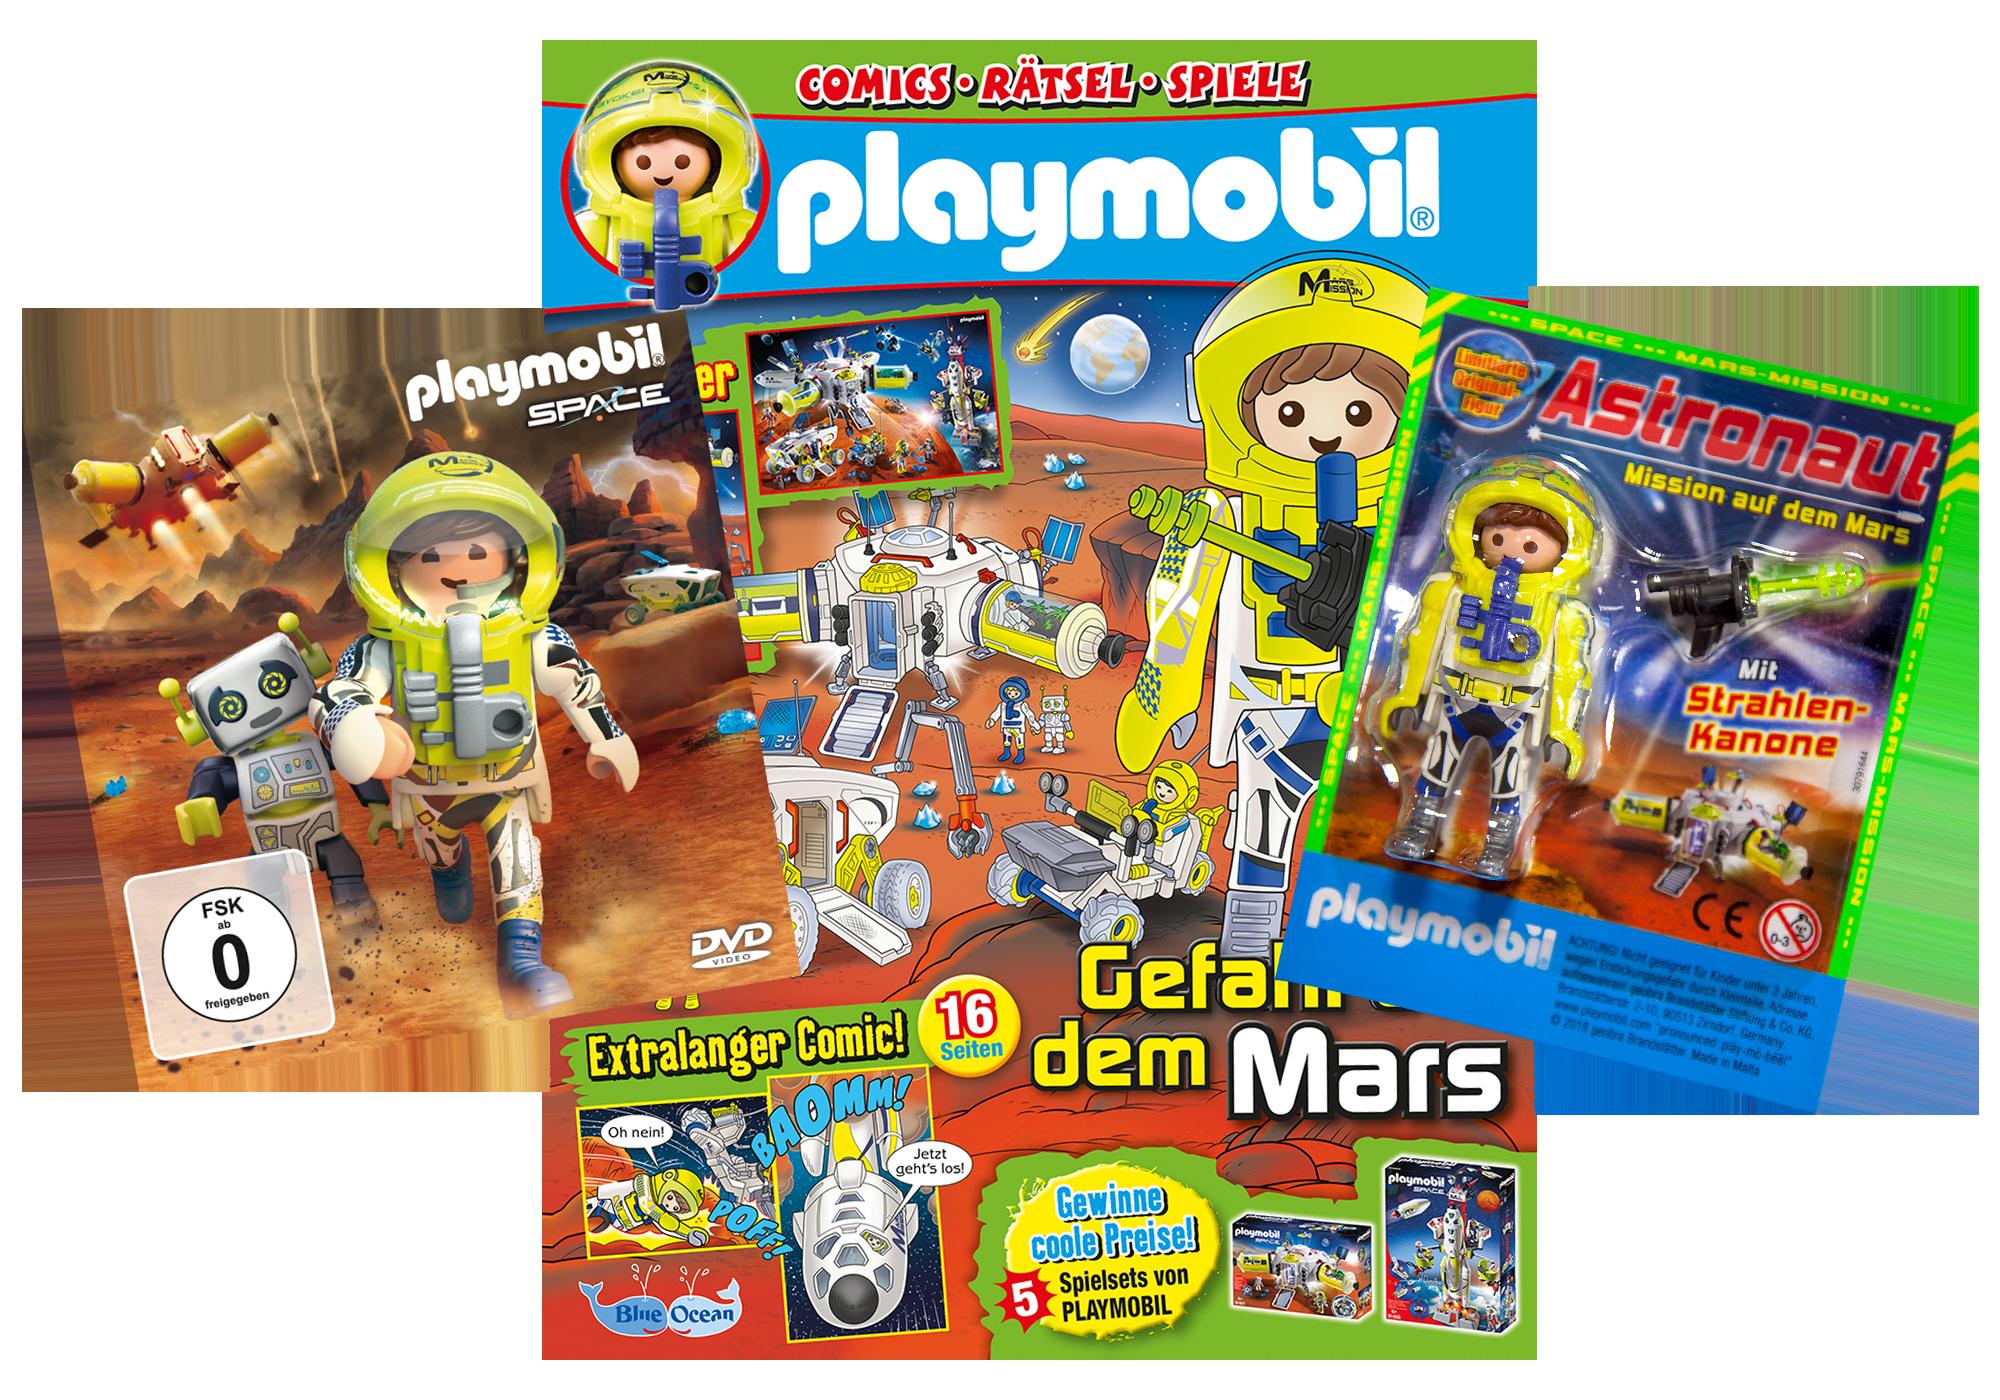 http://media.playmobil.com/i/playmobil/80616_product_detail